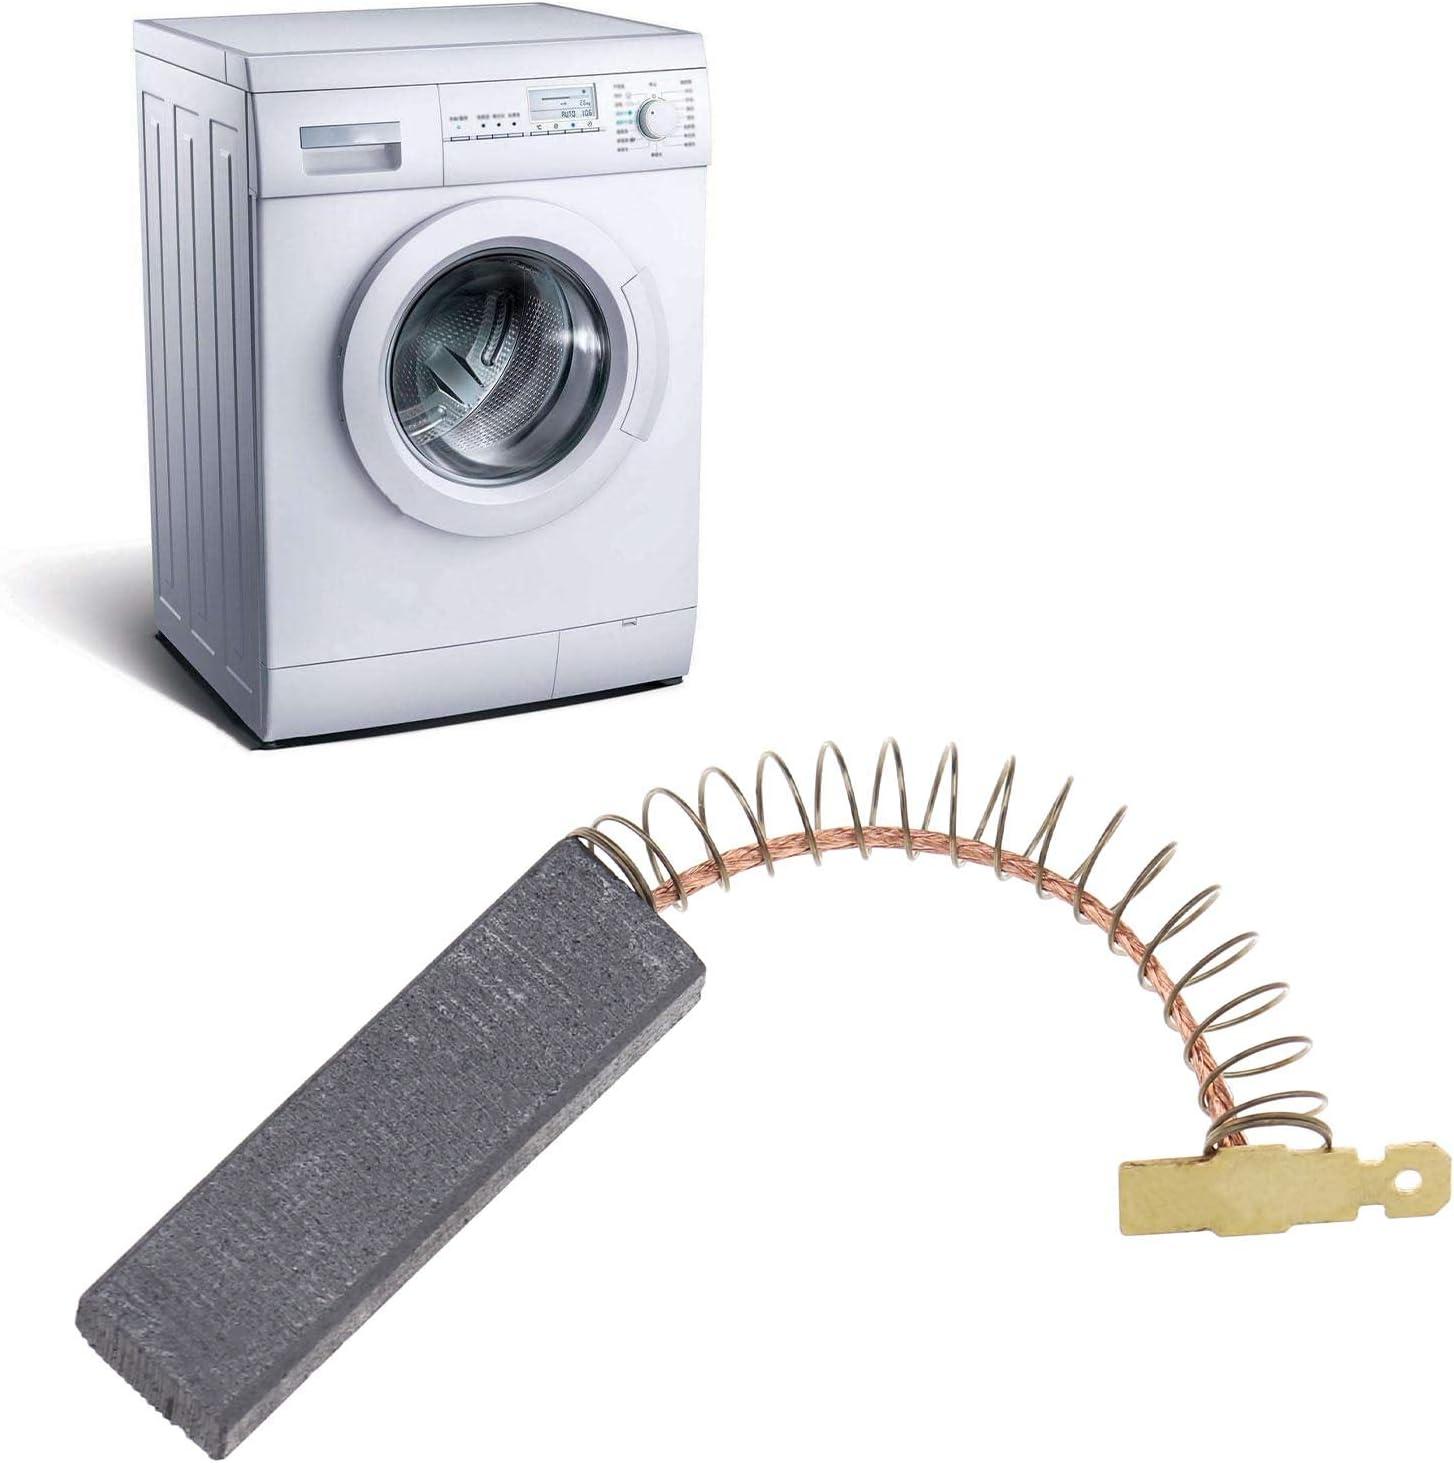 2pcs Industrial Washing Machine Vacuum Motor Replacement Carbon Brush